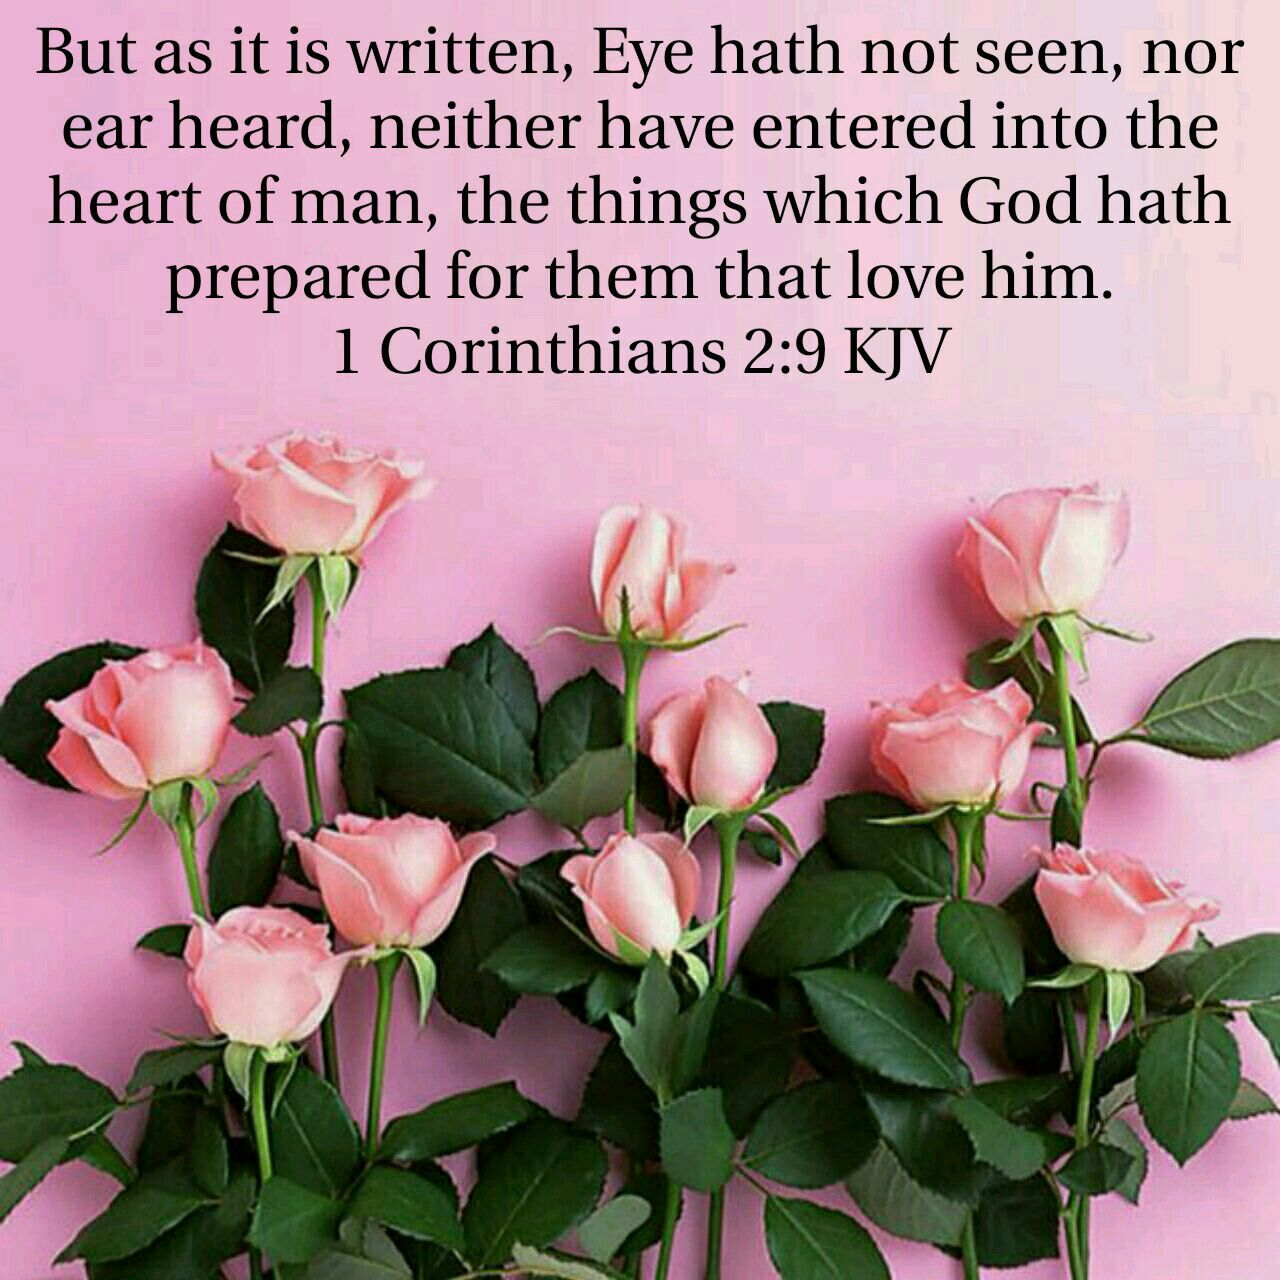 1 Corinthians 2:9 KJV   Phone wallpaper pink, Pink wallpaper iphone, Flowers photography wallpaper